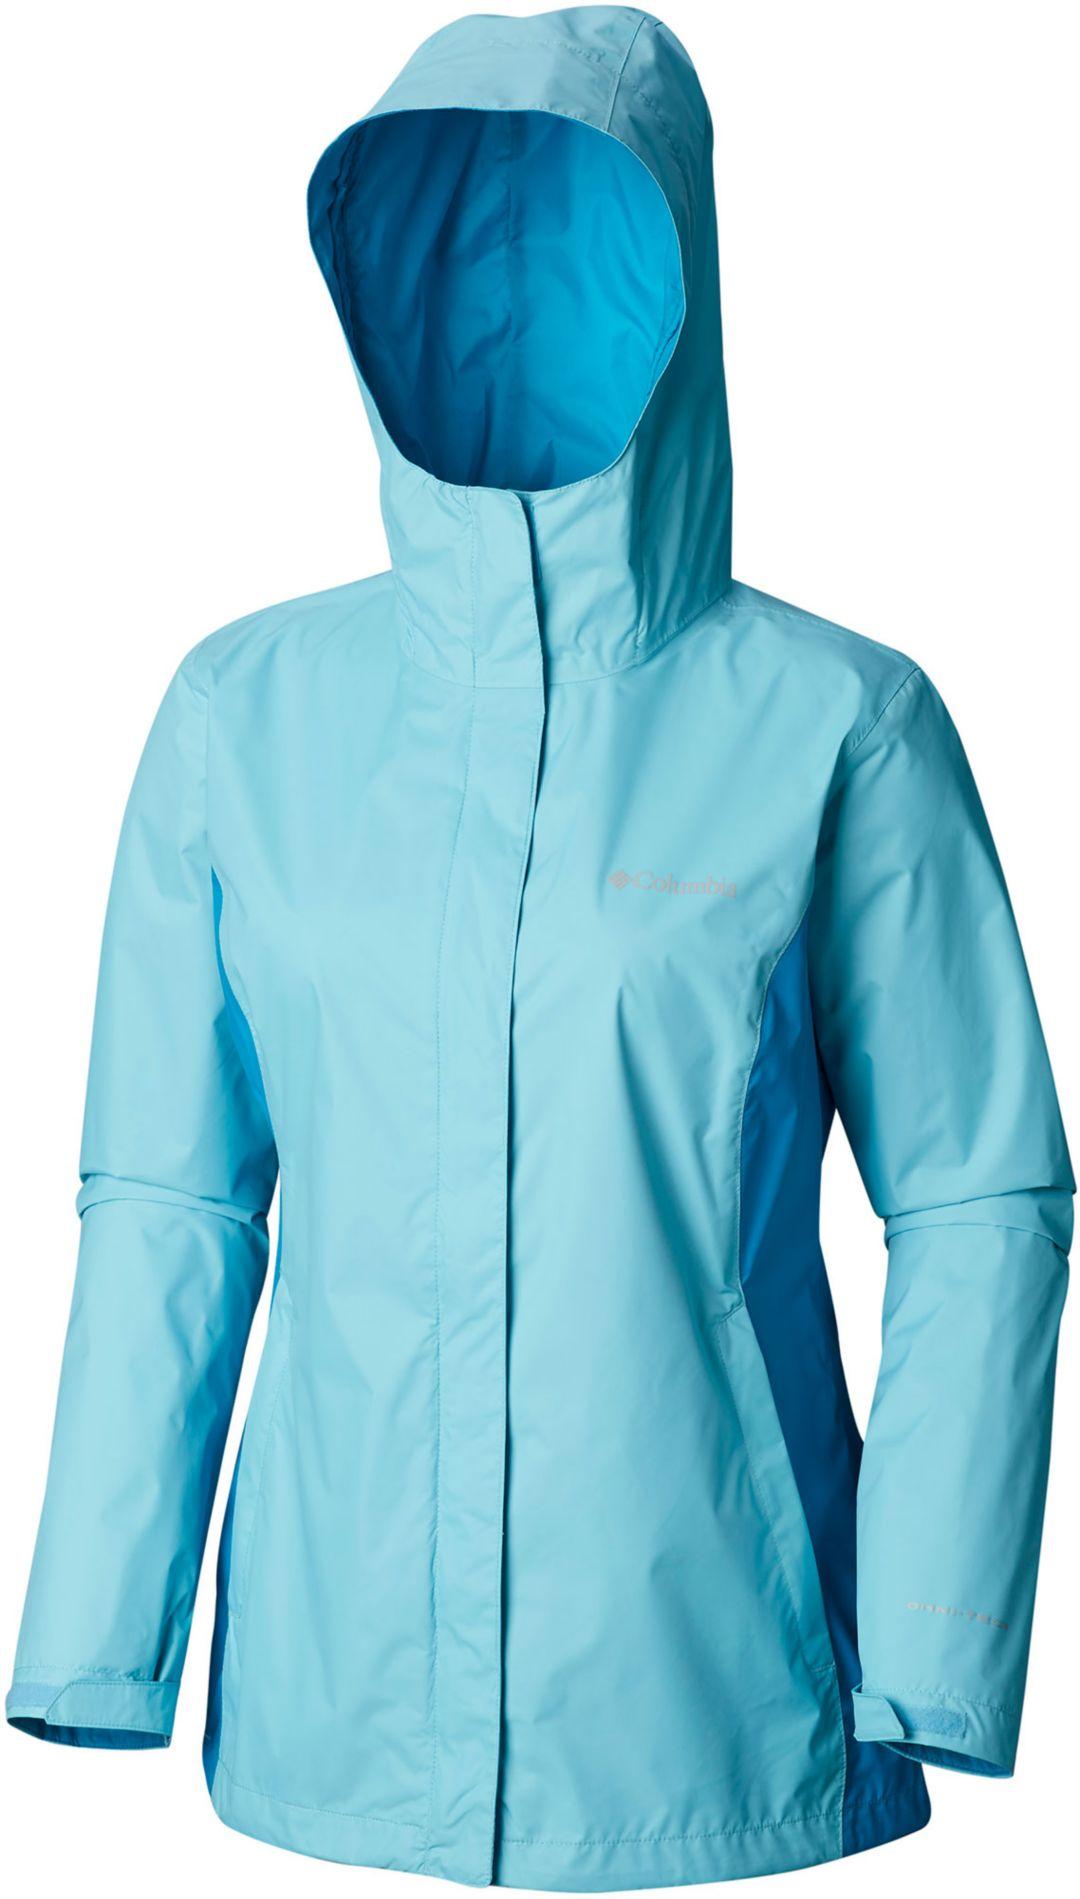 9097ff7ae Columbia Women's Arcadia II Rain Jacket | DICK'S Sporting Goods